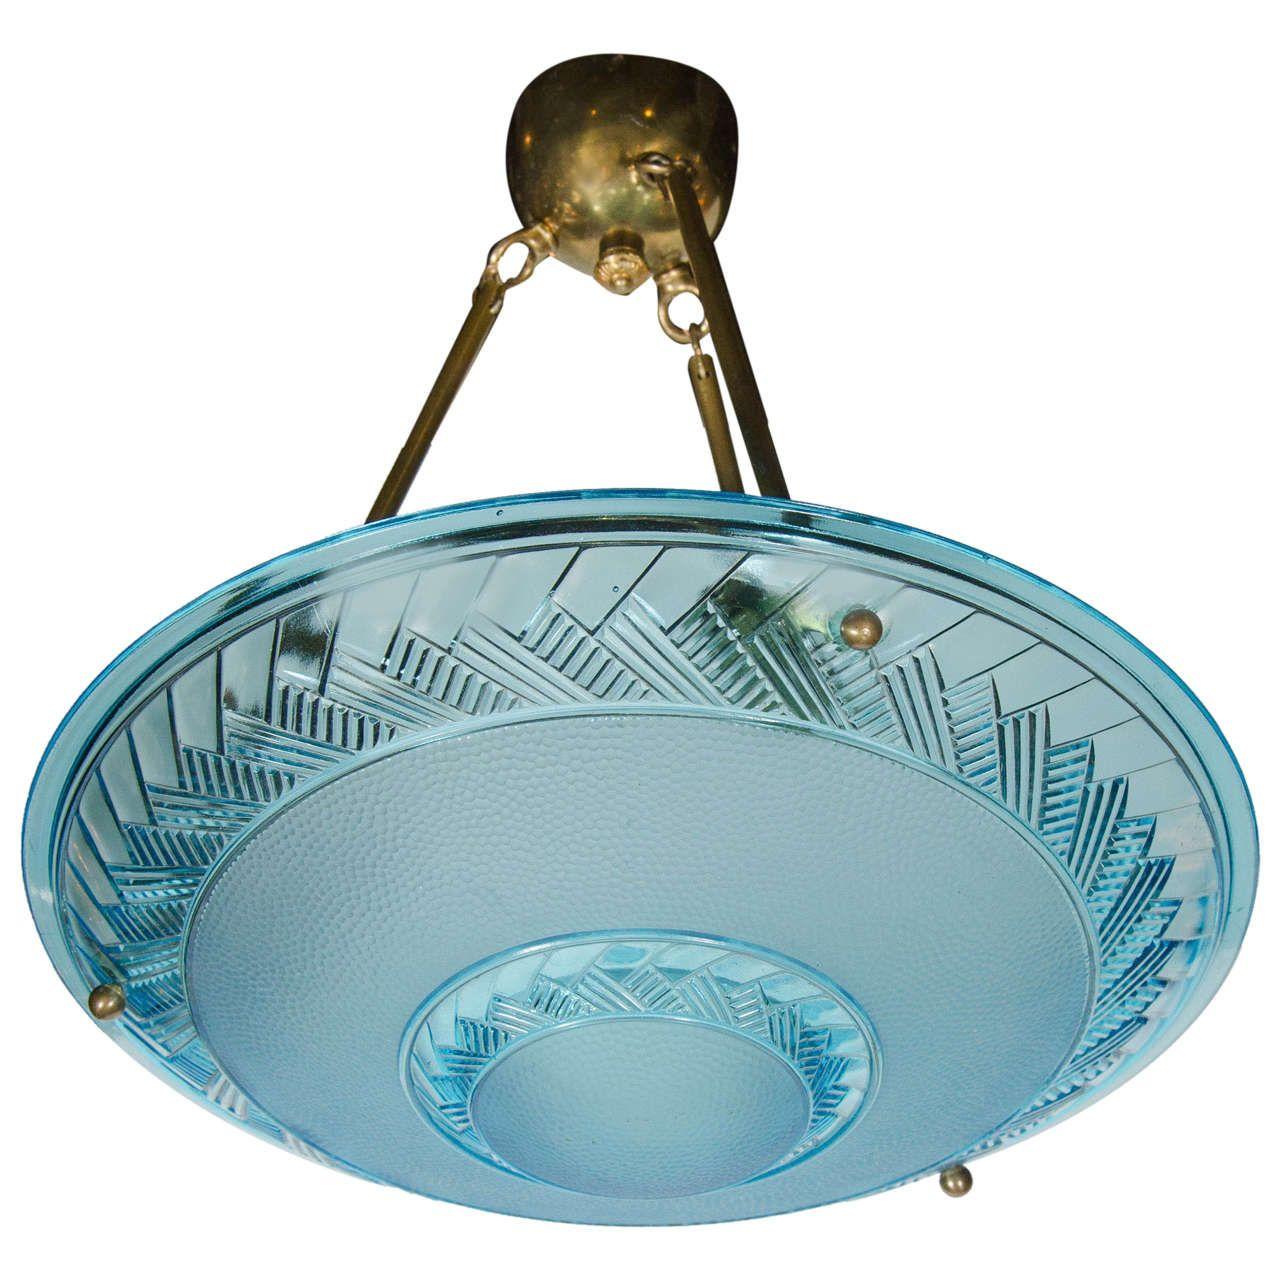 Art deco flush mount chandelier in blue glass by degue flush mount art deco flush mount chandelier in blue glass by degue from a unique collection of arubaitofo Choice Image